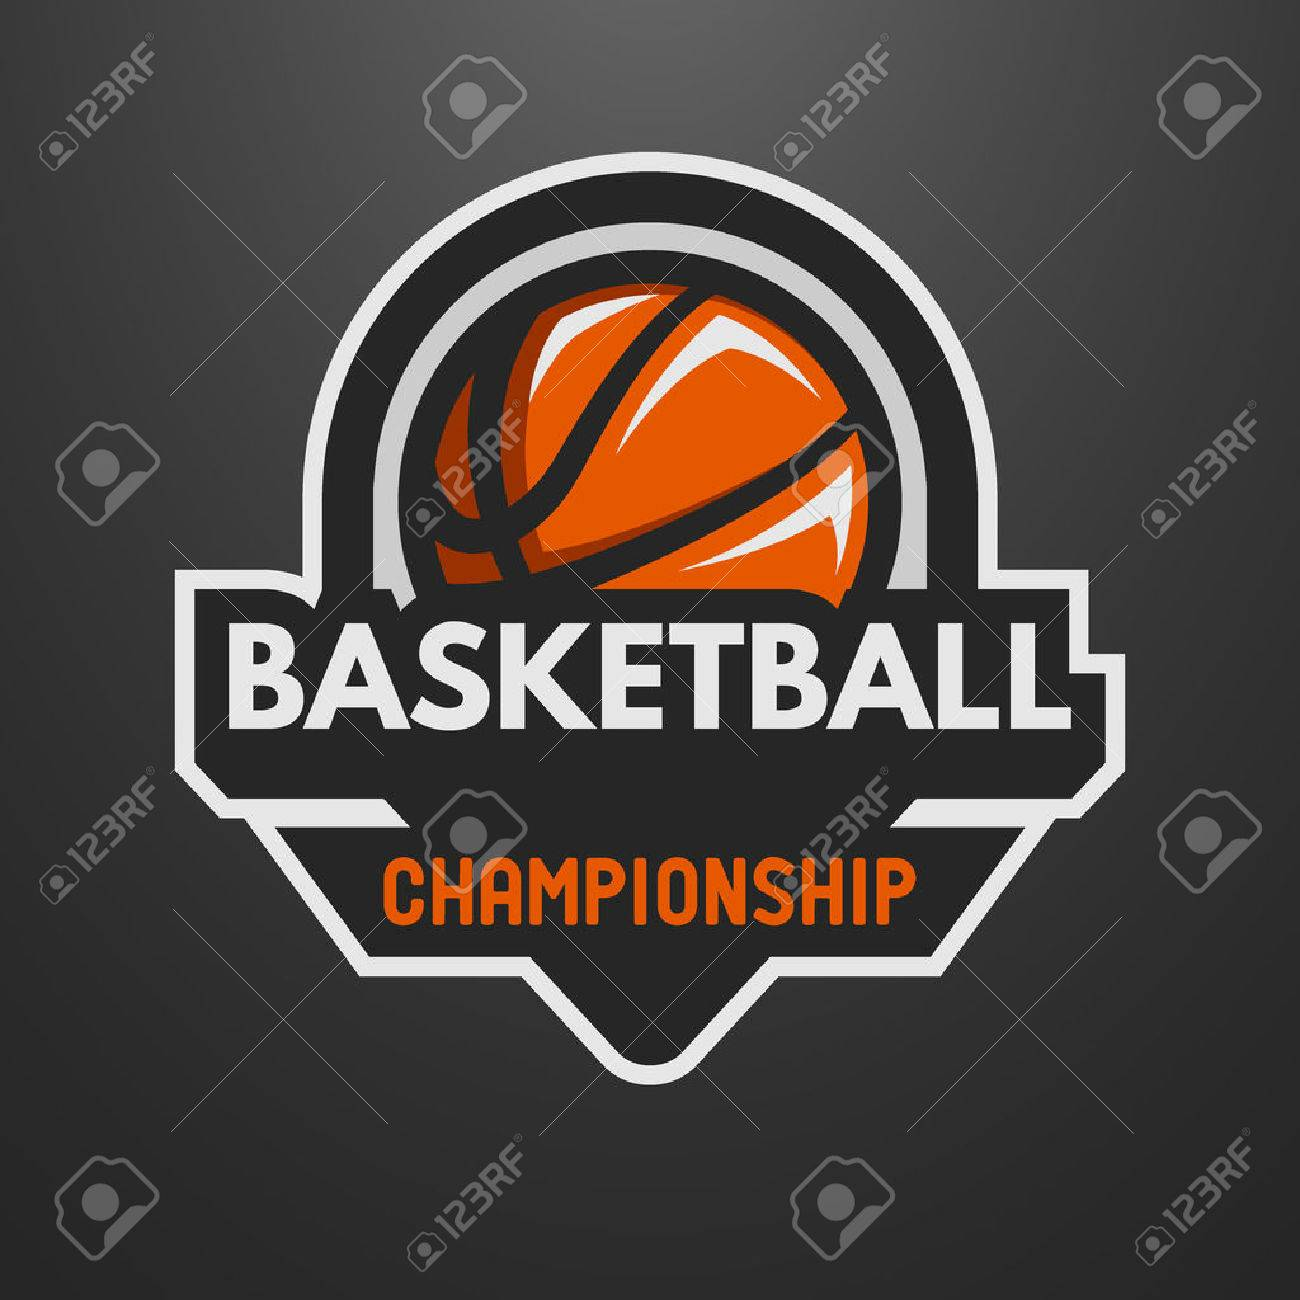 Basketball sports logo, label, emblem on a dark background. - 47563303